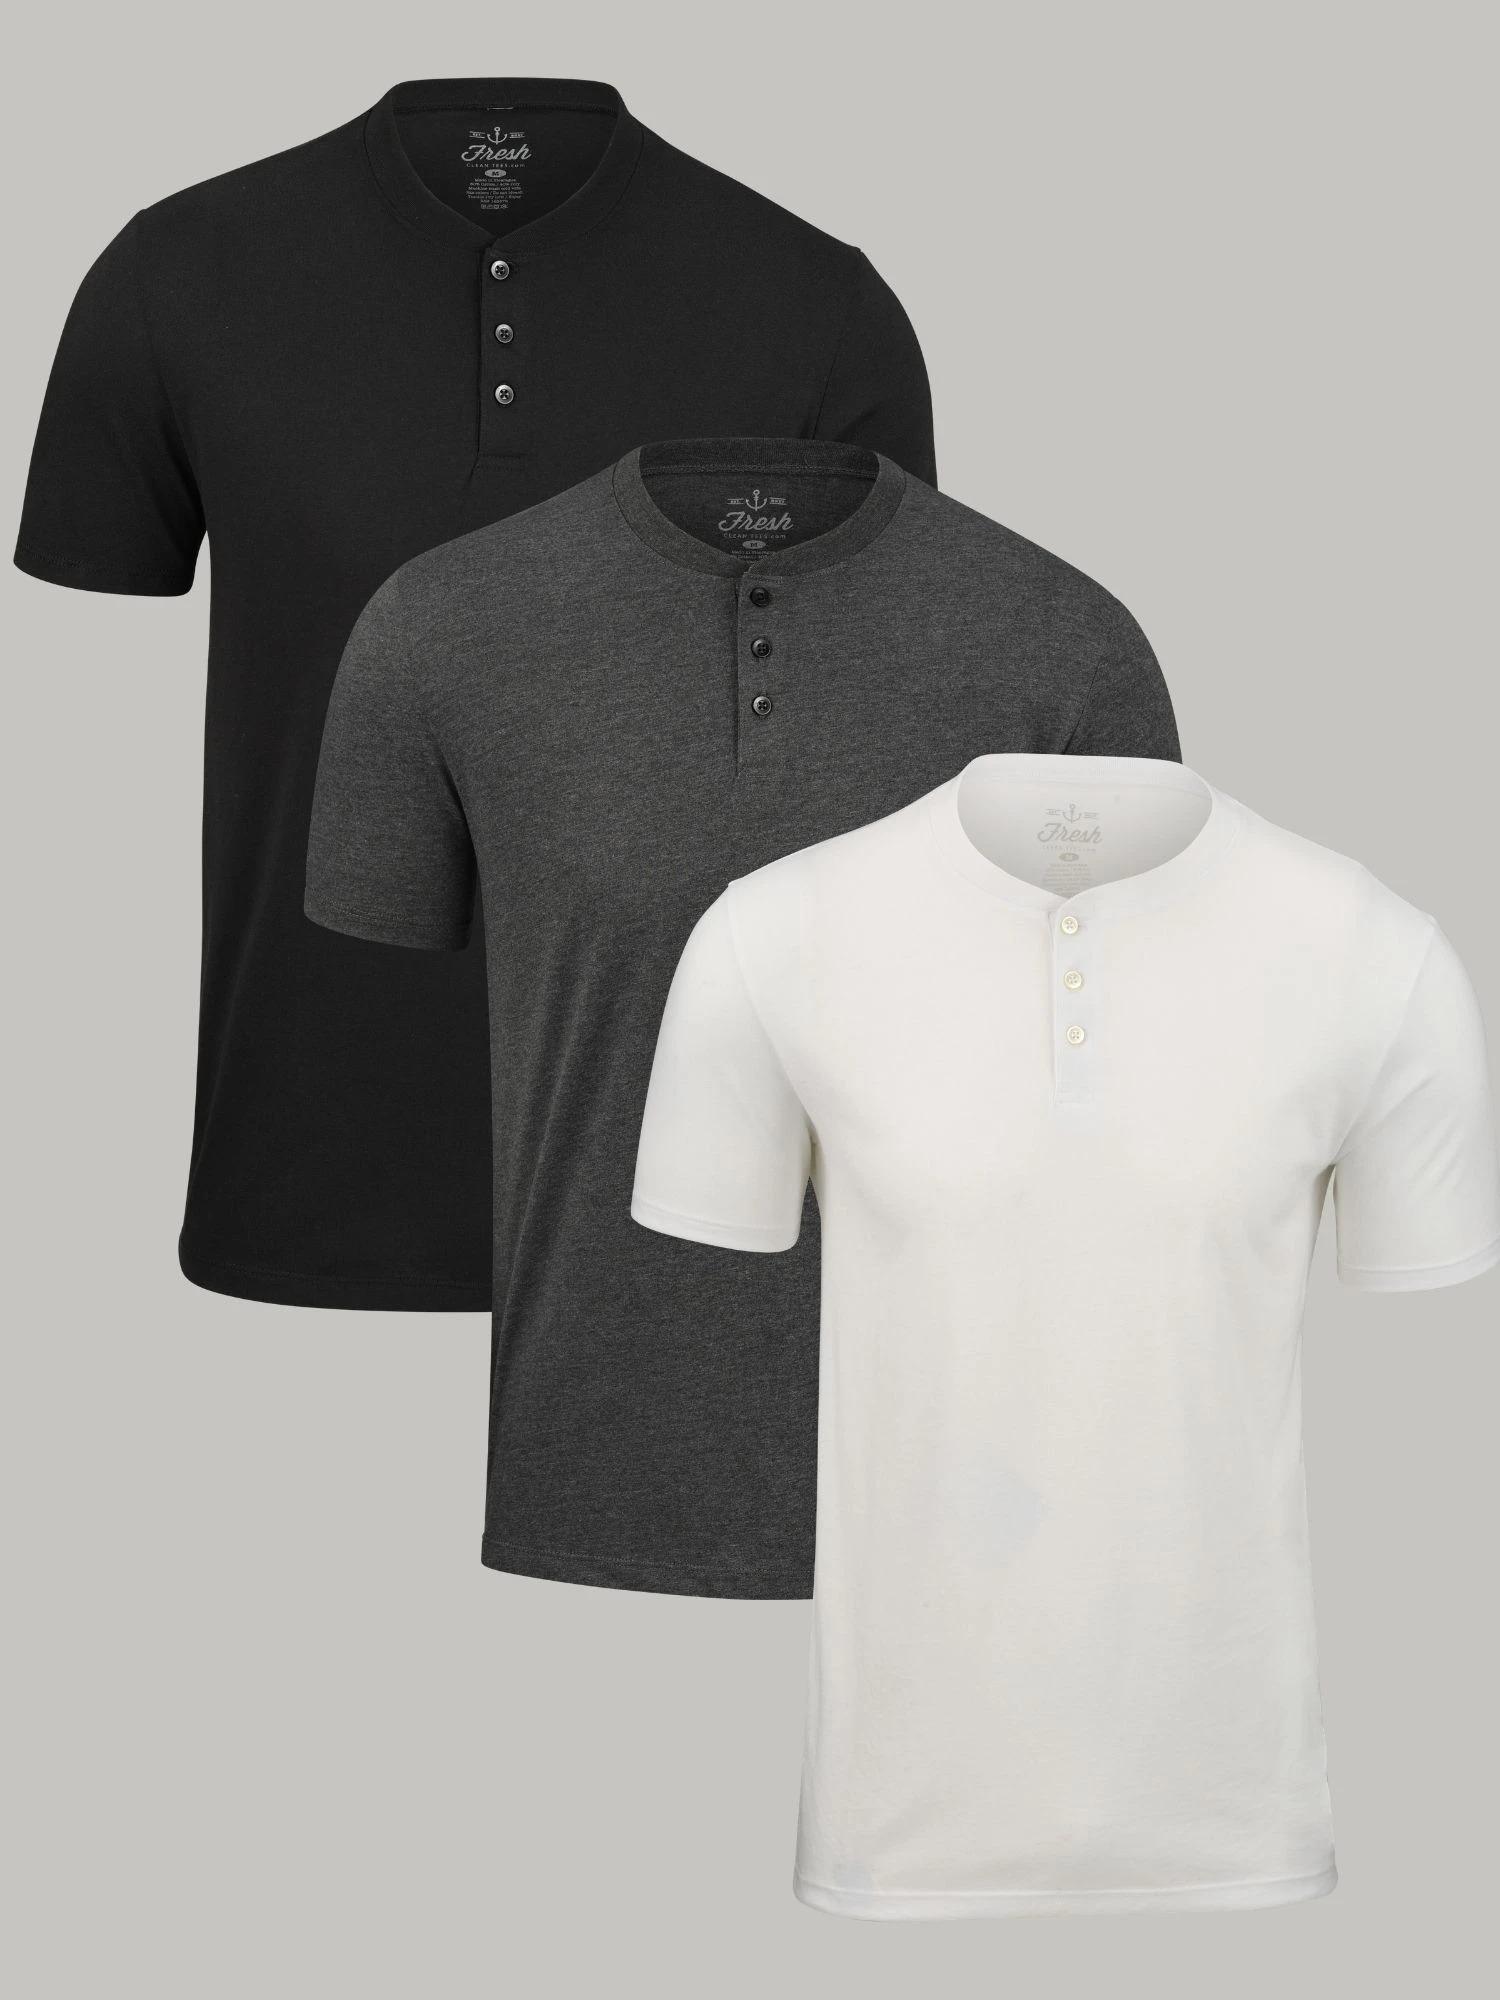 Fresh Clean Tees Short-Sleeve Henley 3-pack, best henley shirts